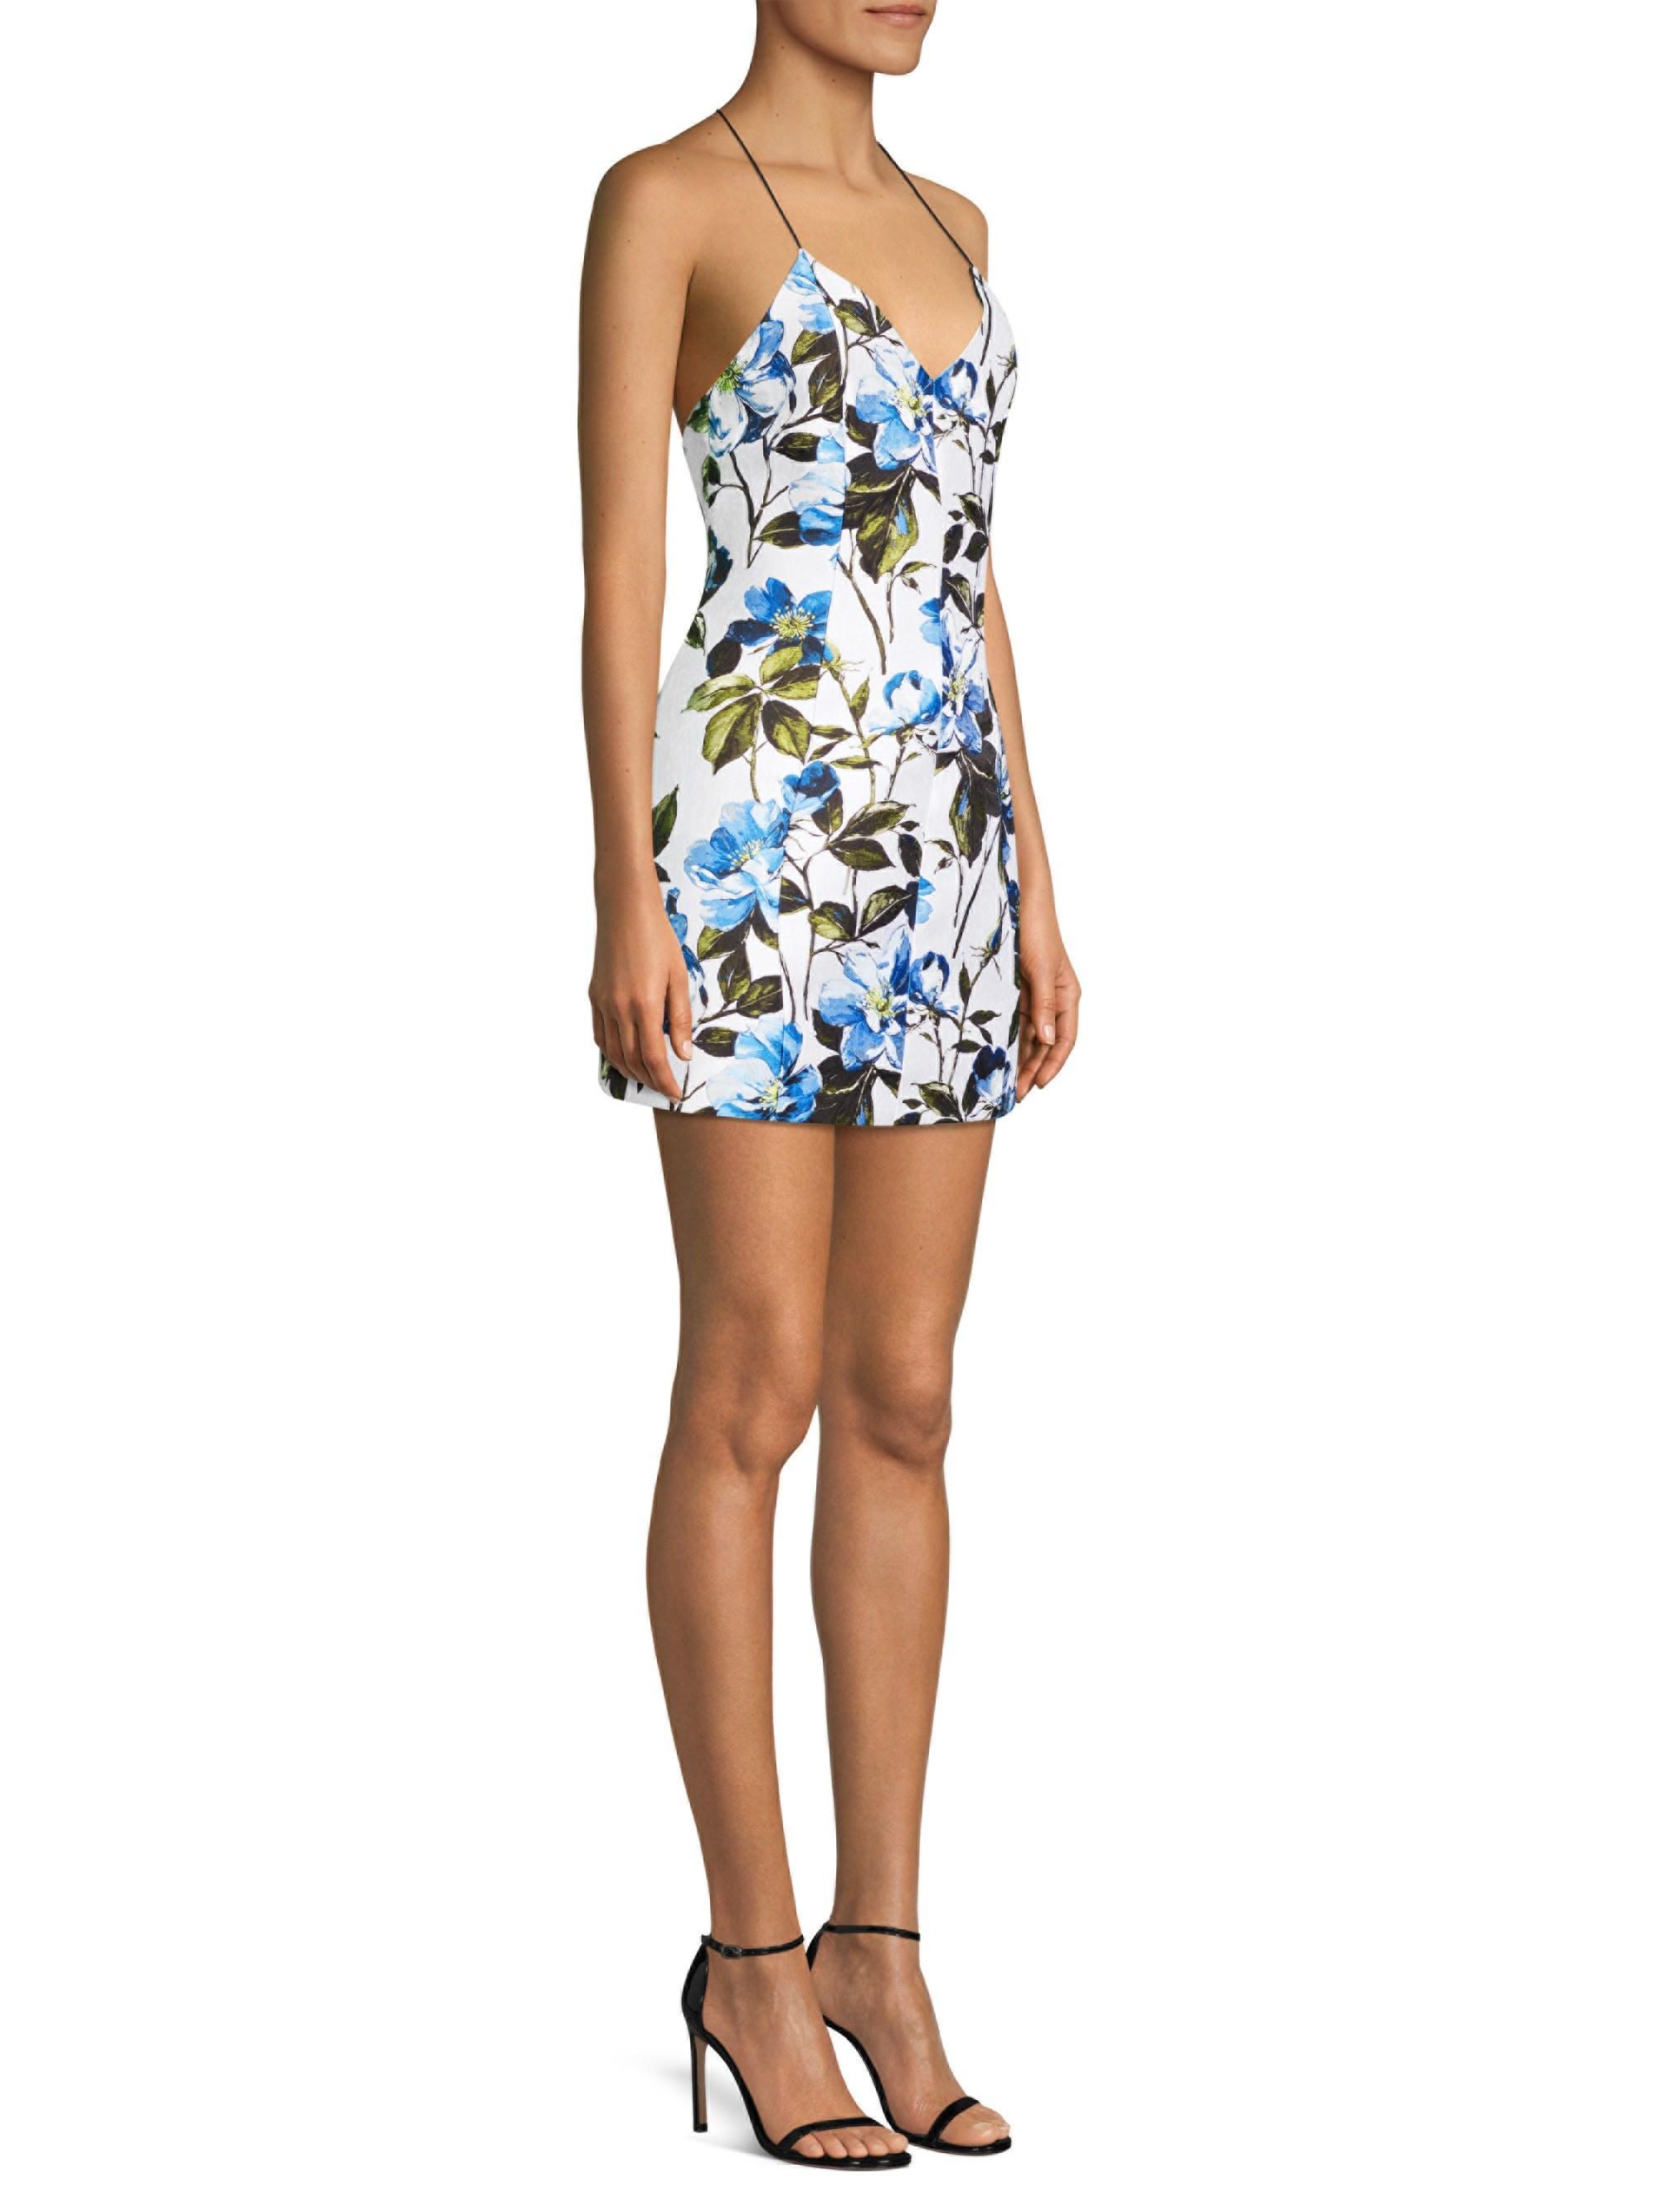 0e164fa970ec Alice + Olivia Alice + Olivia Tayla Floral Structured Lantern Mini Dress in  Blue - Lyst